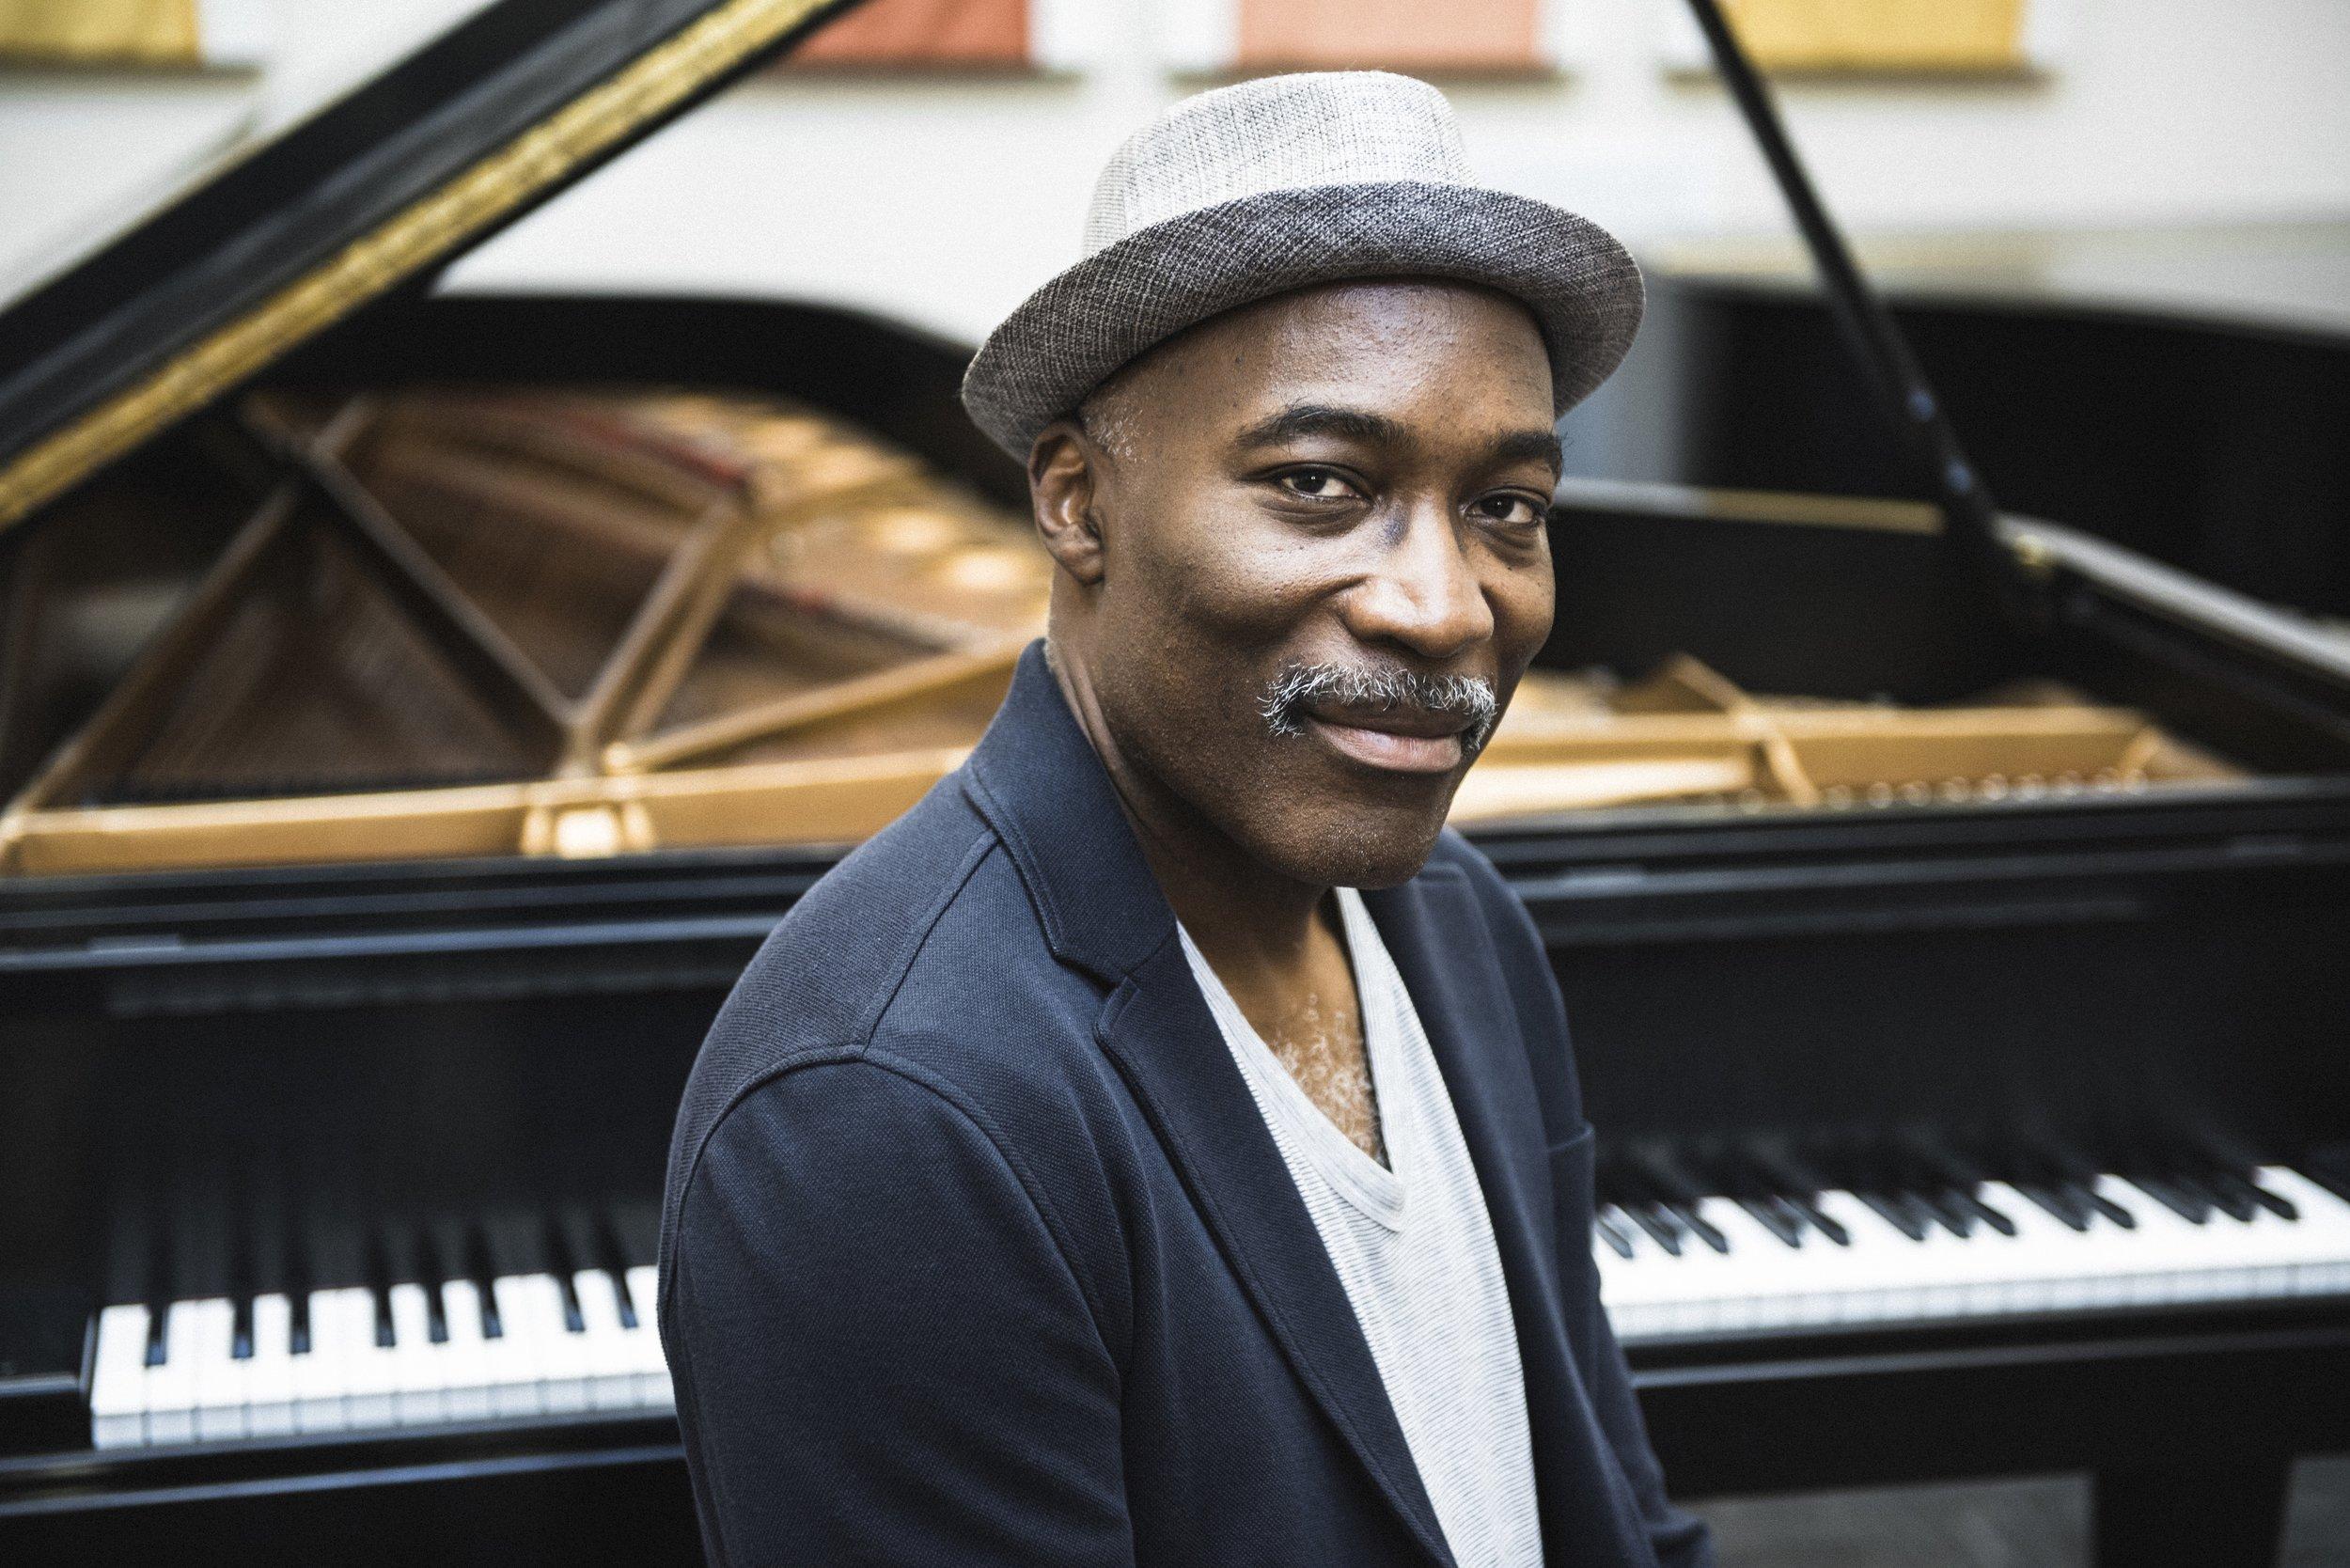 Darrell Grant | Composer/Pianist